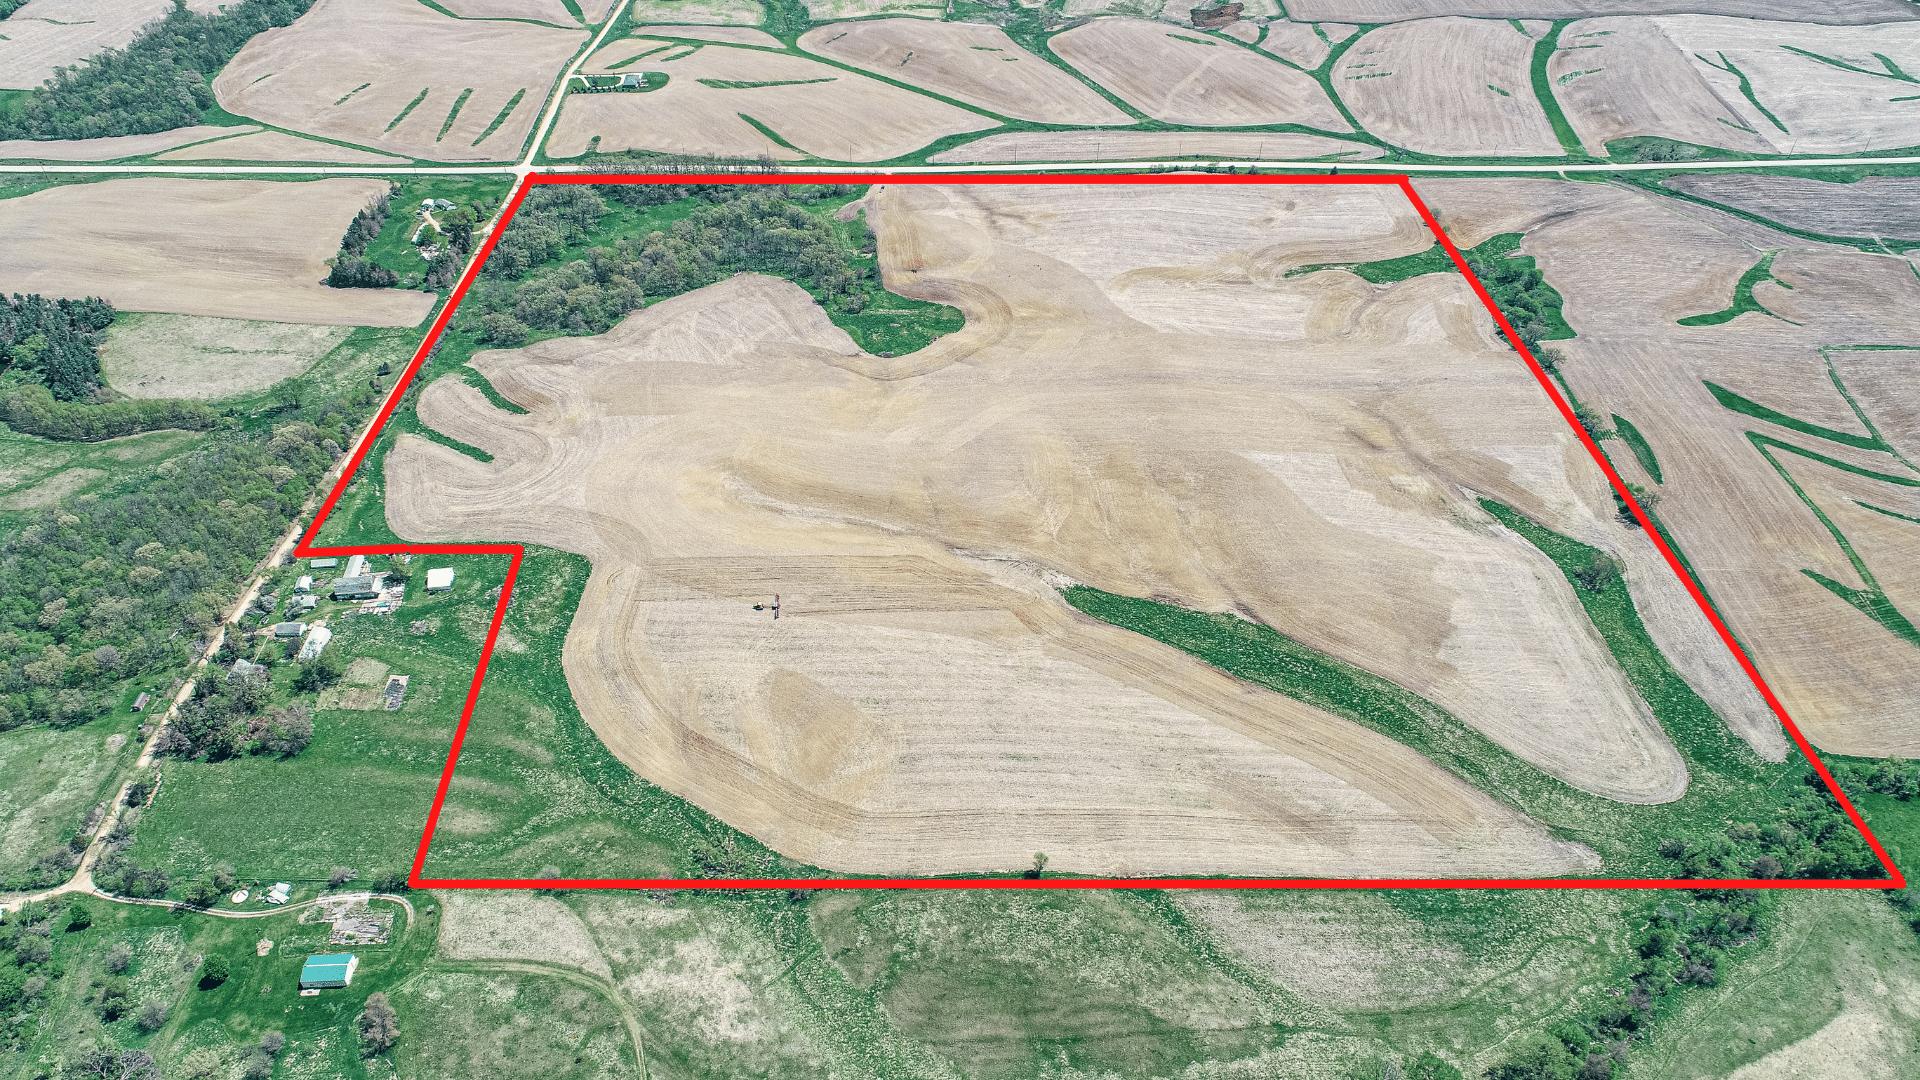 Jones County Farmland For Sale by Auction